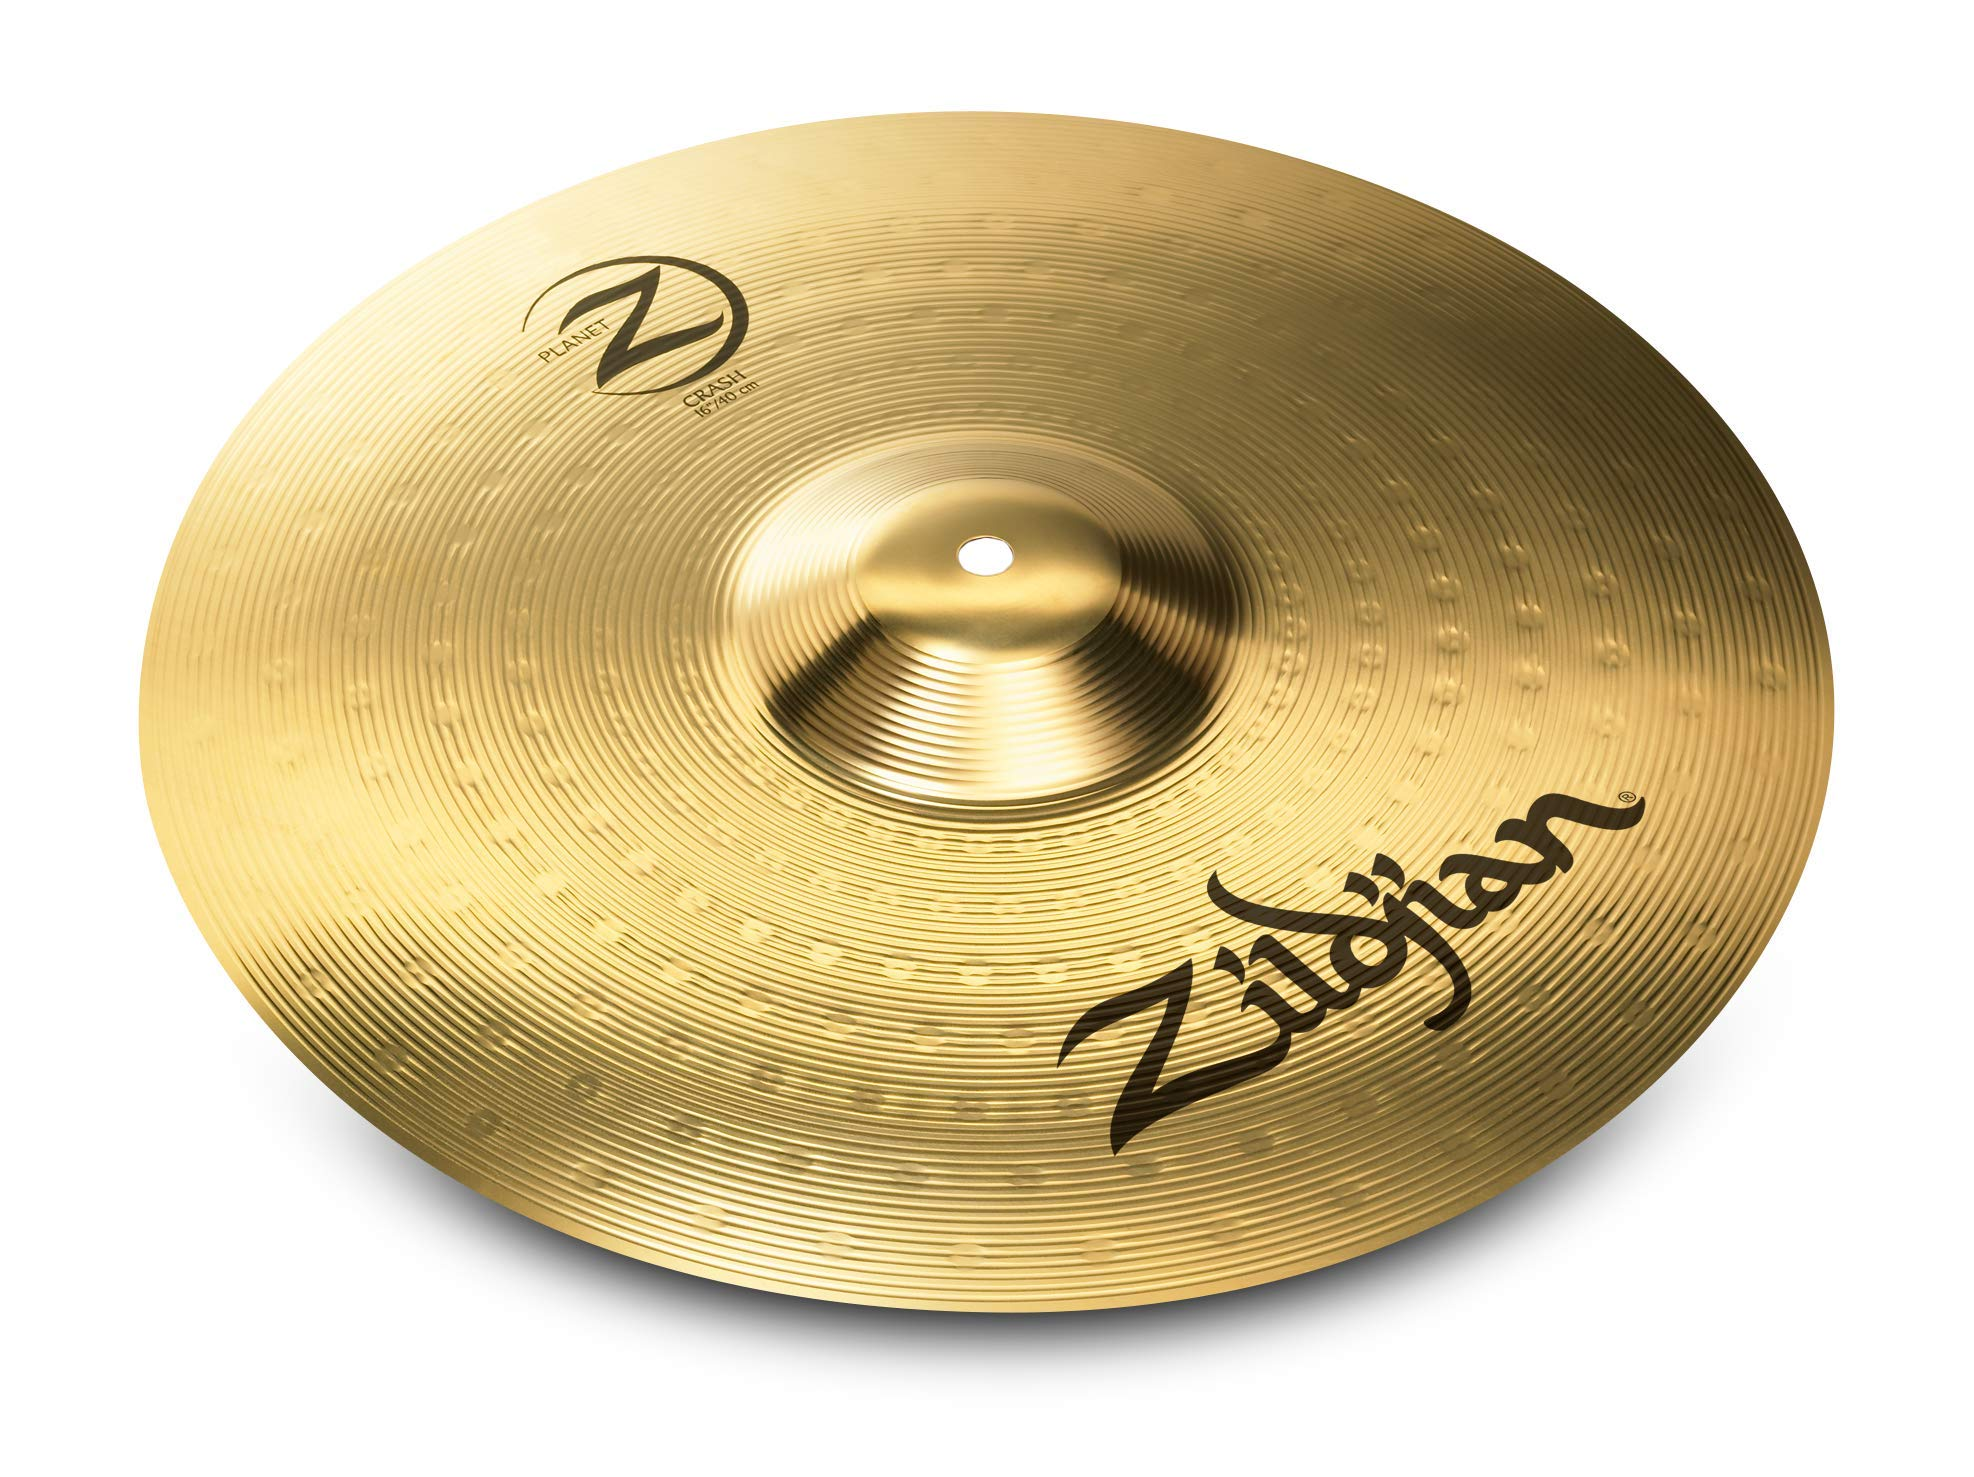 Zildjian Planet Z 4 Cymbal Set (14'' pr, 16'', 20'') by Avedis Zildjian Company (Image #3)